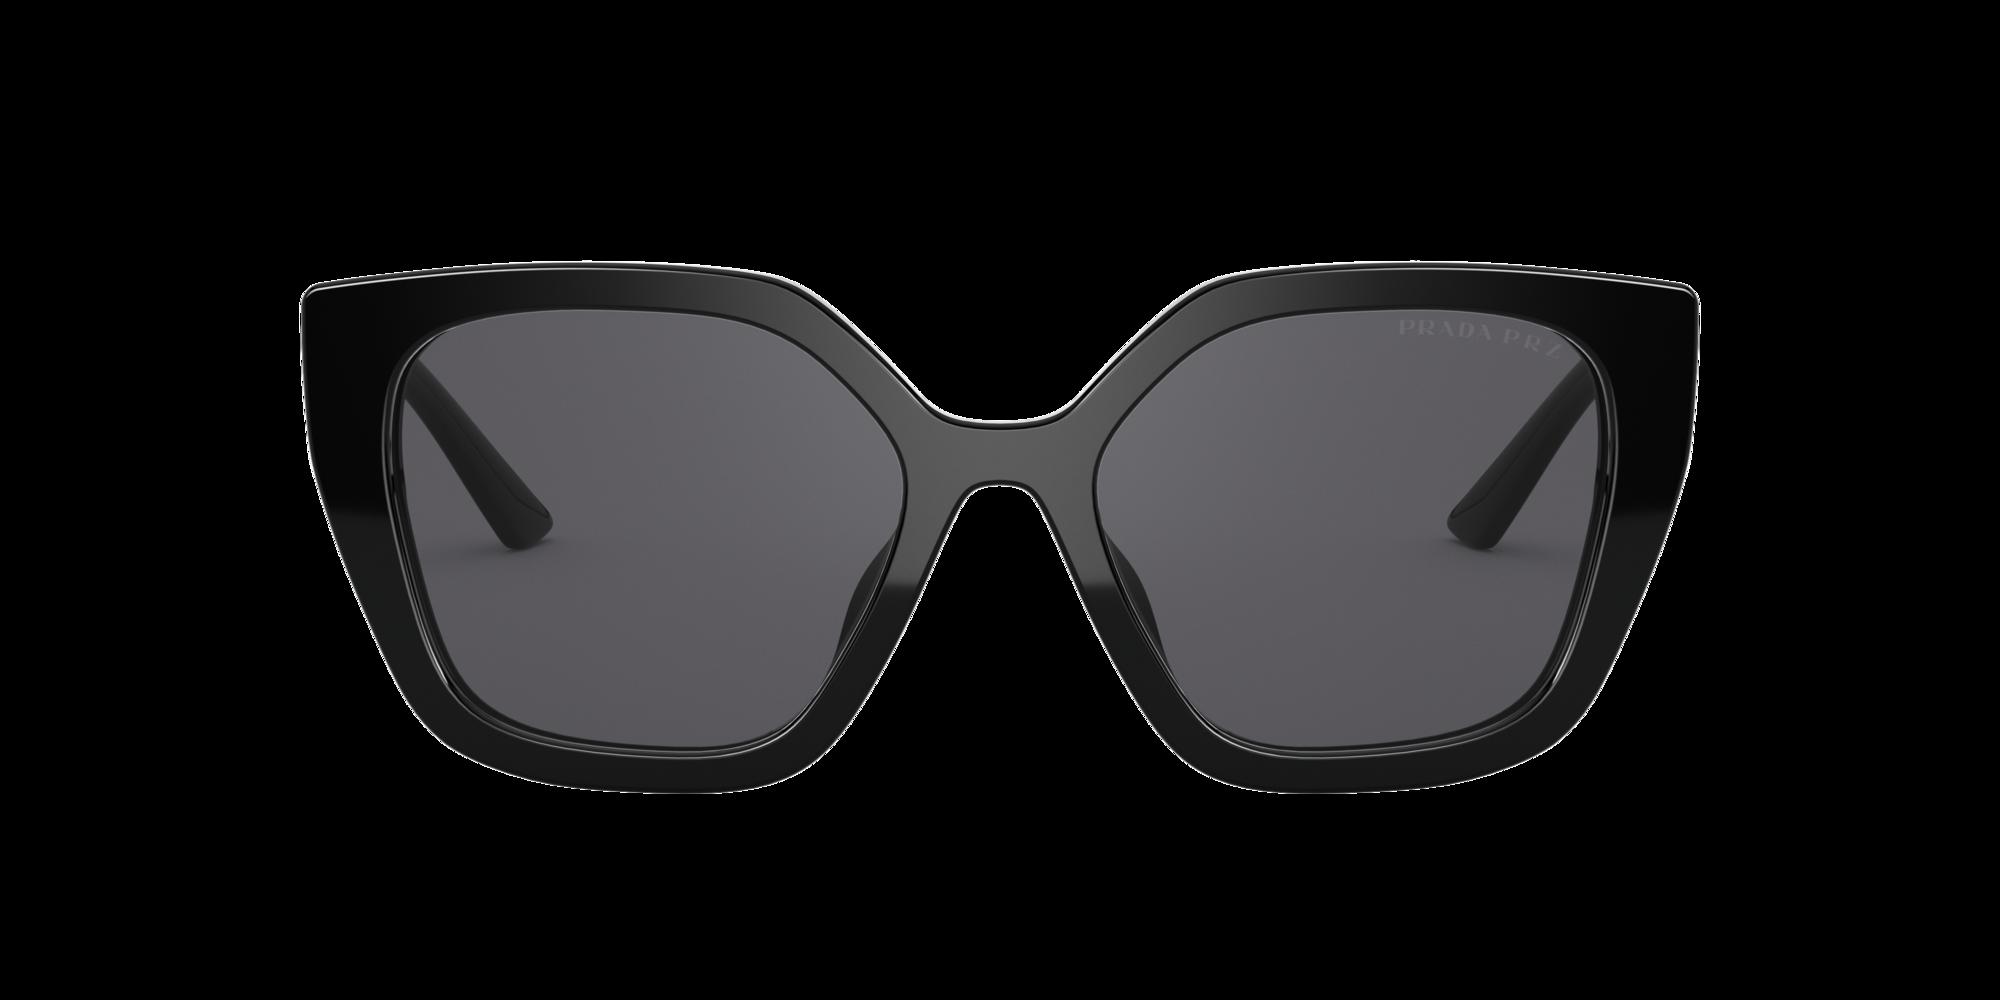 Image for PR 24XS 52 from LensCrafters | Glasses, Prescription Glasses Online, Eyewear